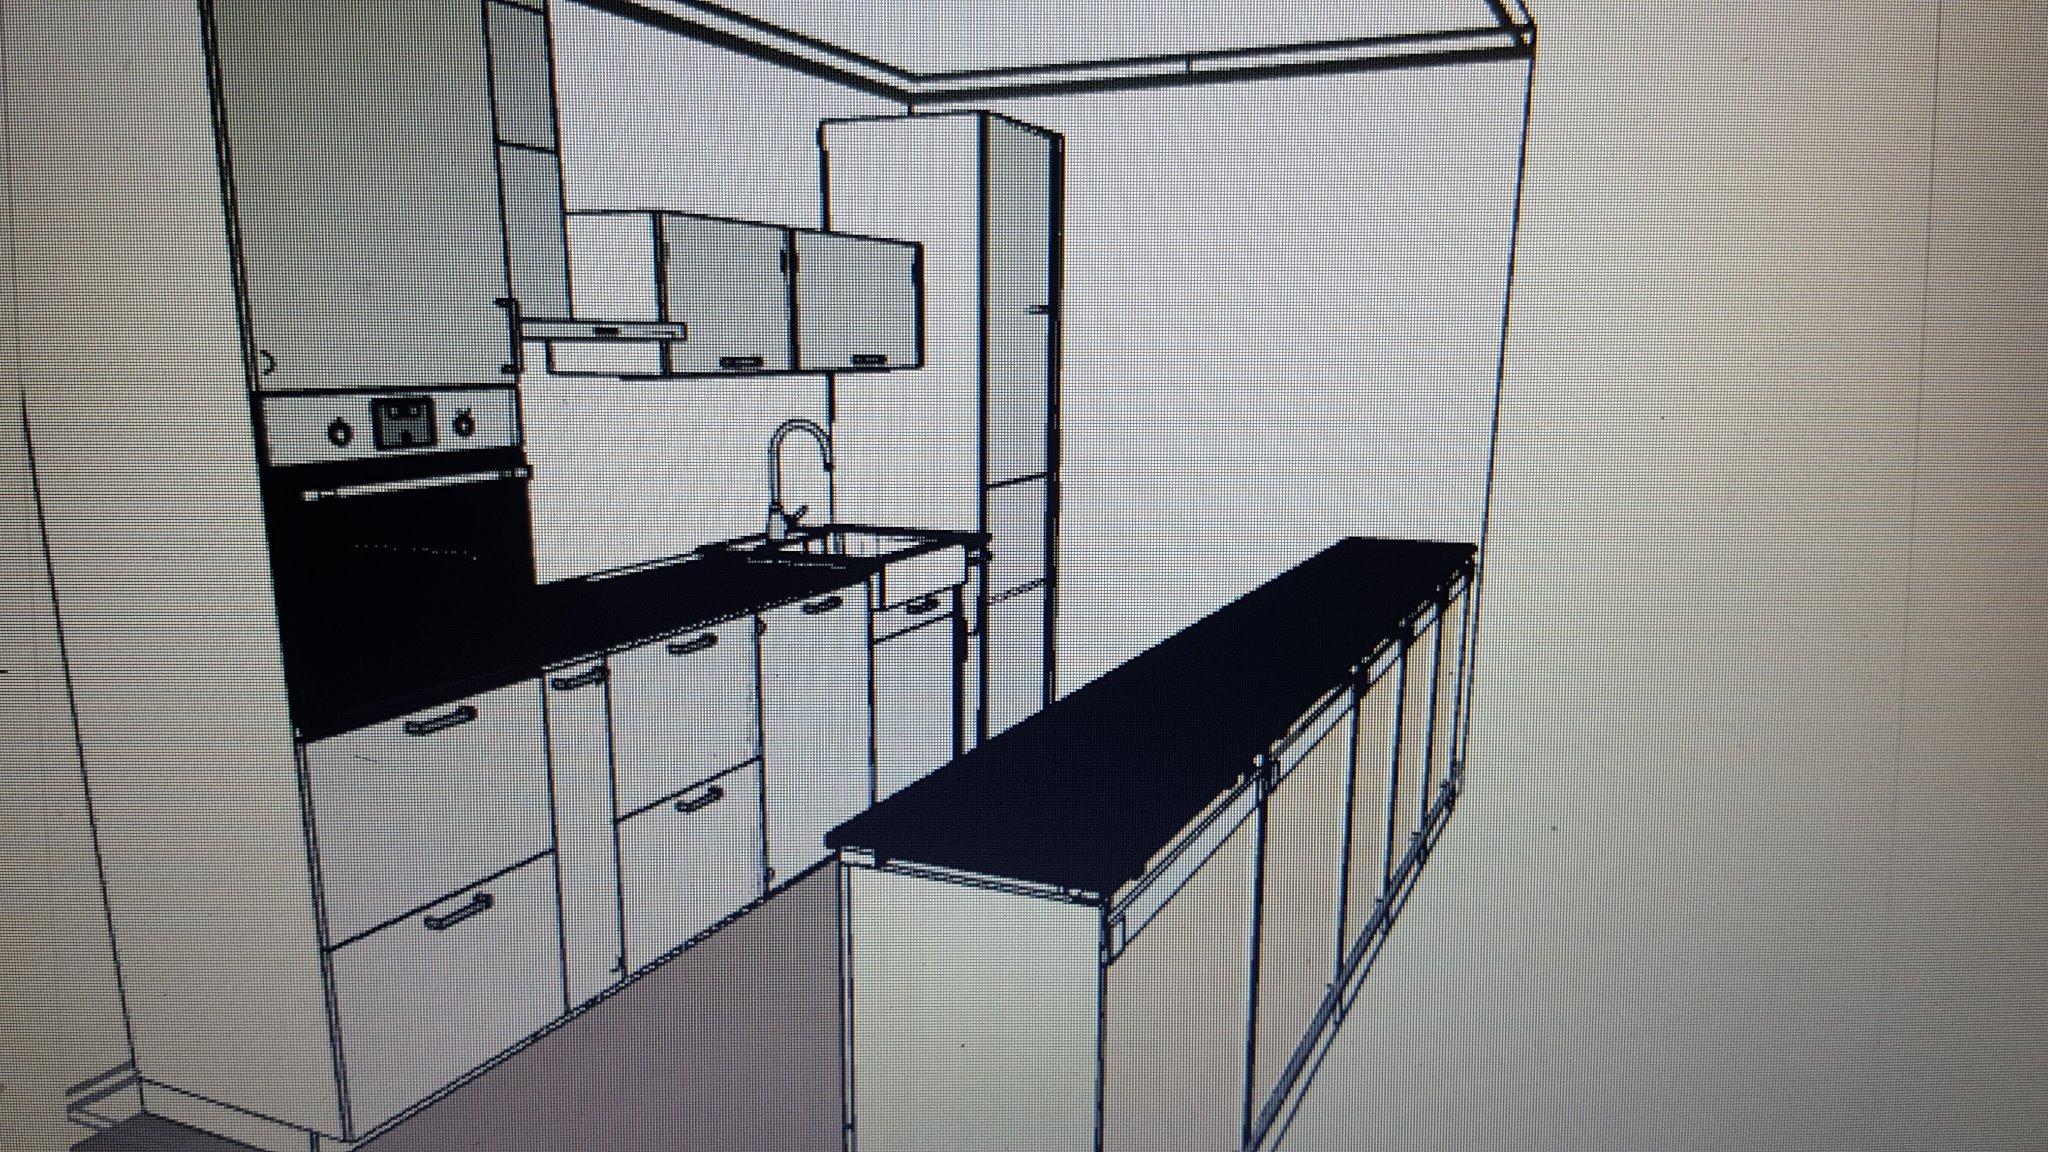 keuken carrousel monteren : Ikea Hoekkast Carrousel Simple Tutemo Open Kast Antraciet Xx Cm